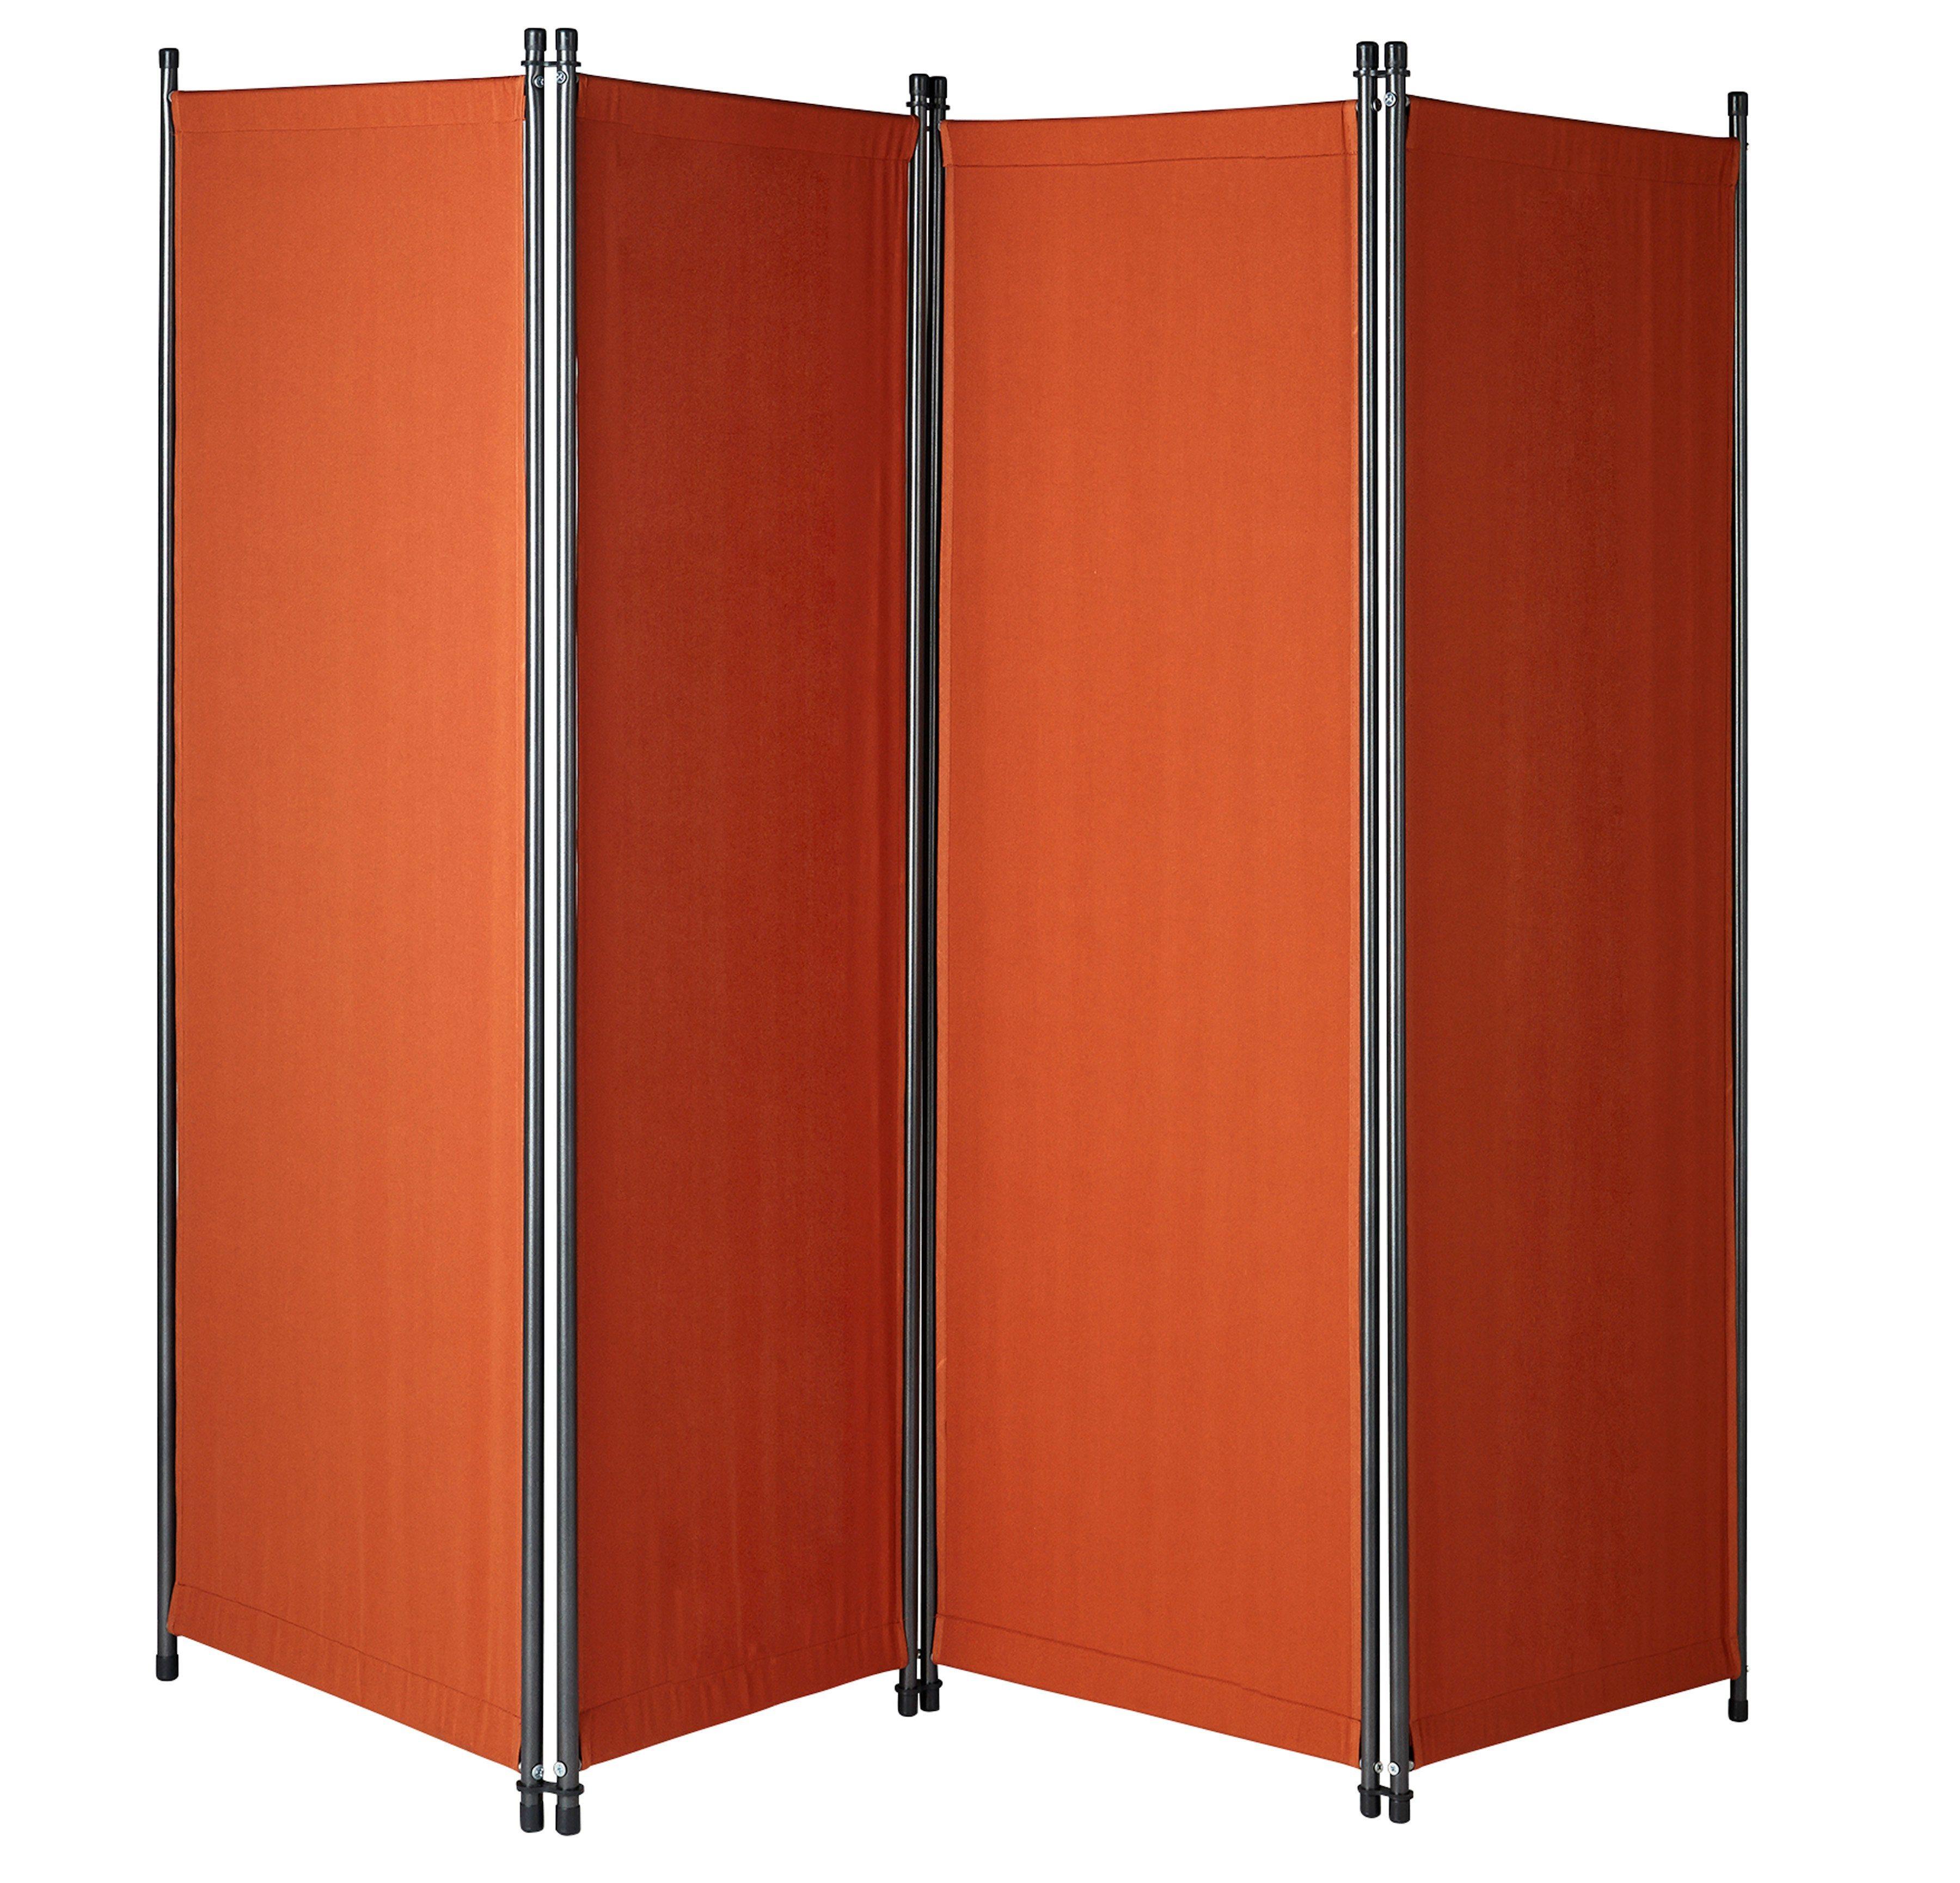 Paravent »Swingtex«, (B/H): ca. 220x165 cm | Wohnzimmer > Regale > Raumteiler